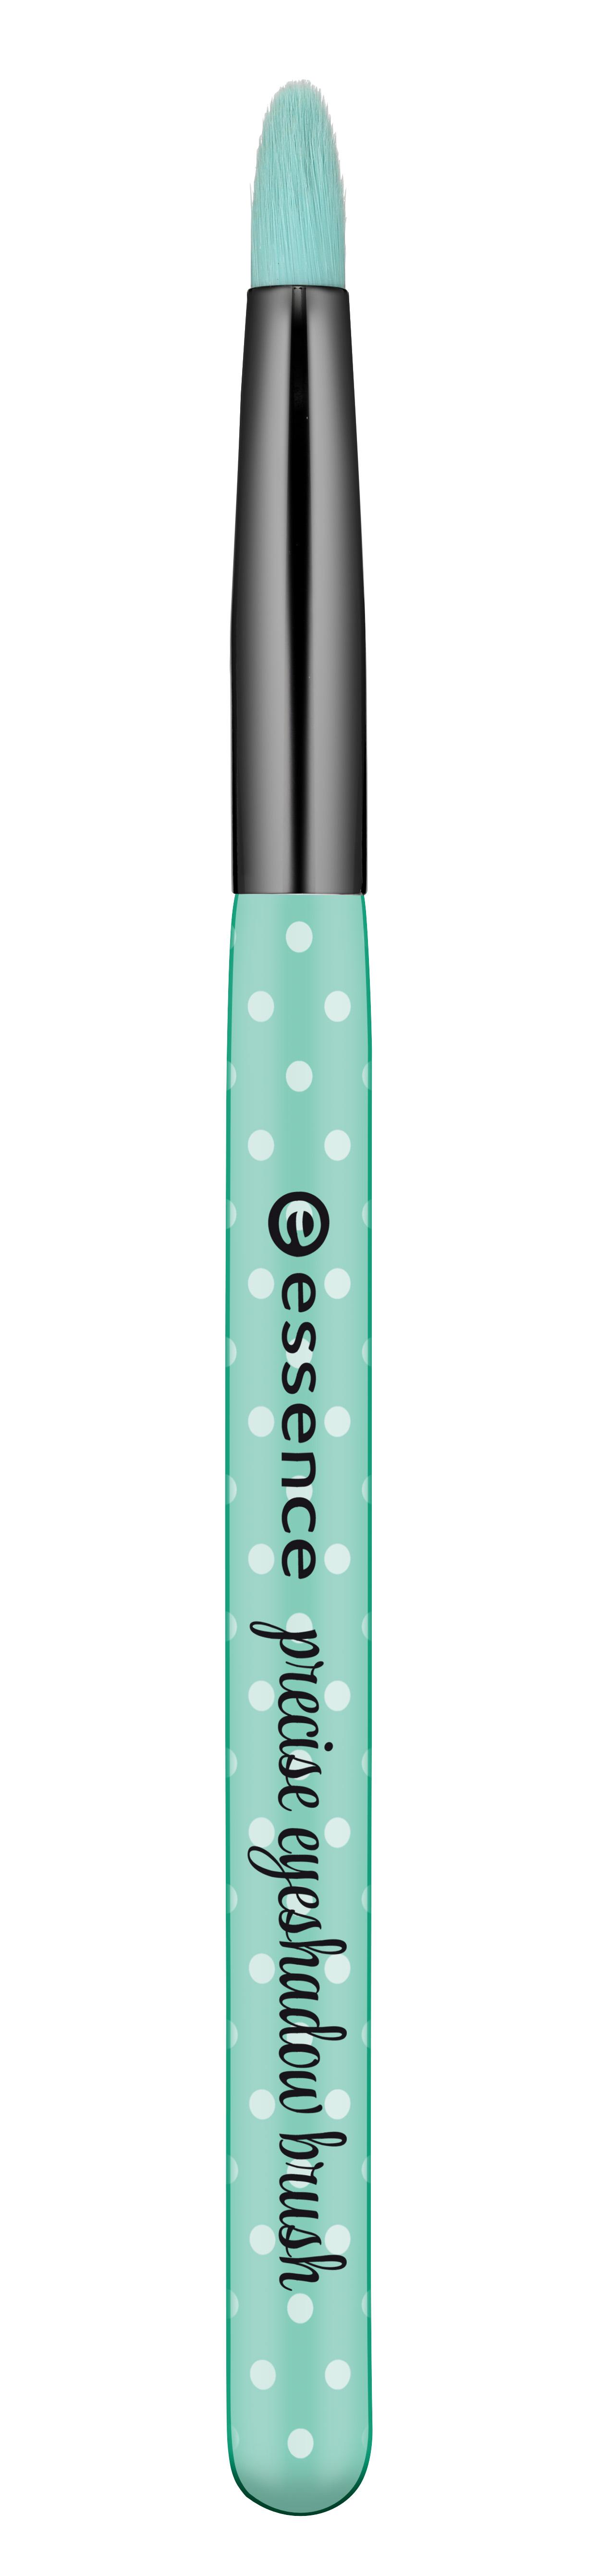 Essence кисти для макияжа отзывы